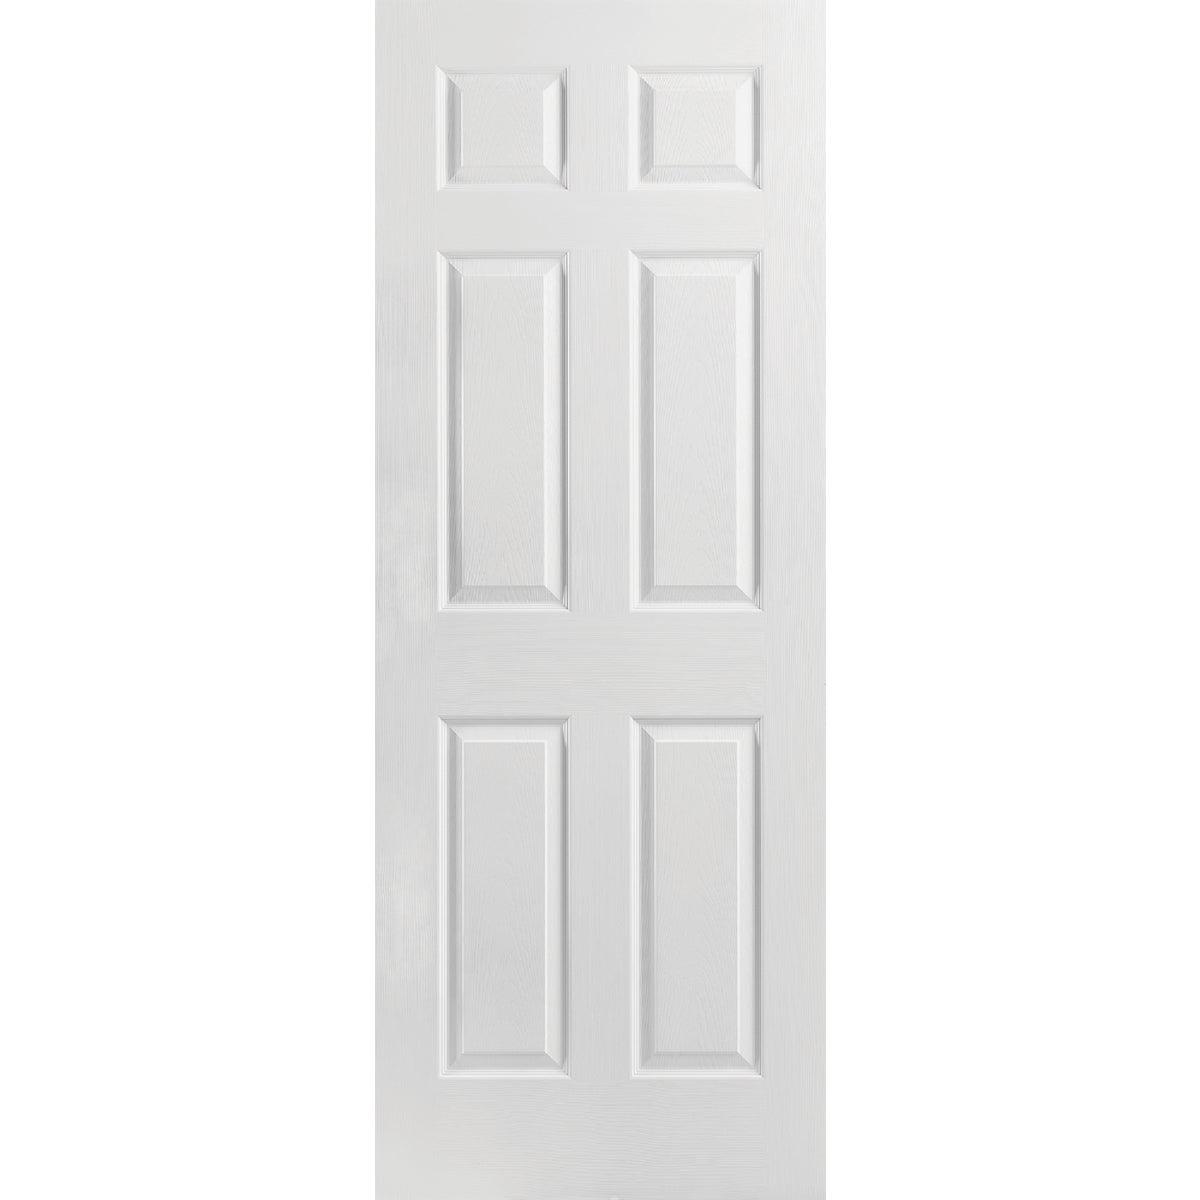 2/8 1-3/8 6PN TX HC DOOR -  by Masonite